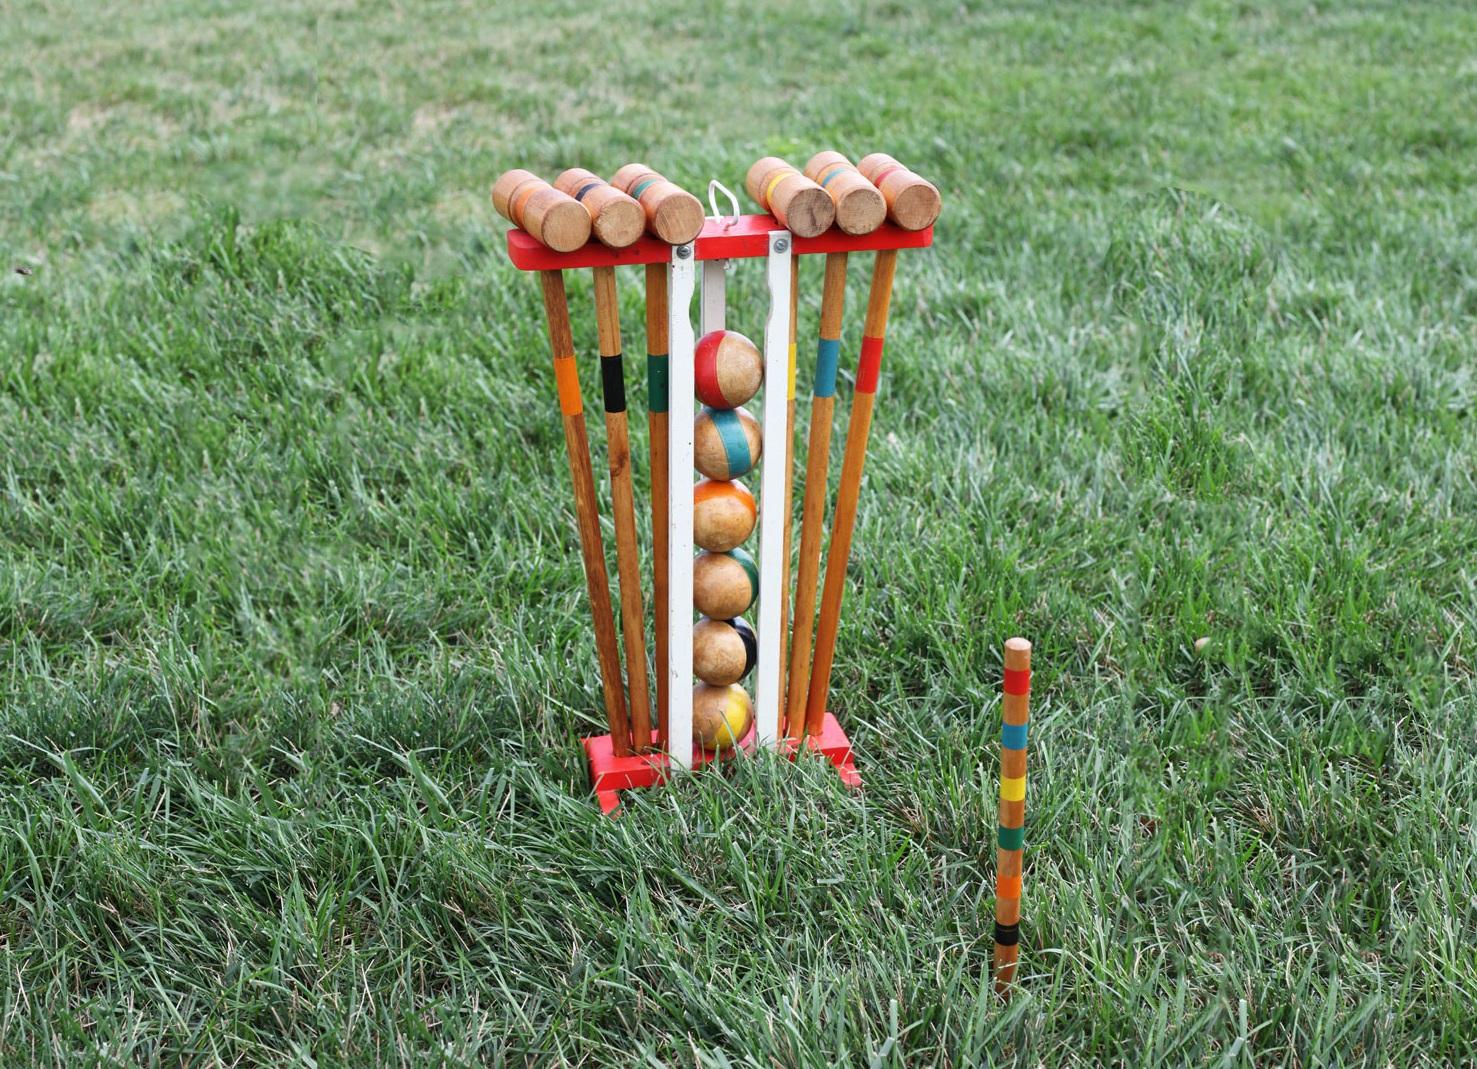 rent-childrens-lawn-games-kiddie-croquet-ny.jpg